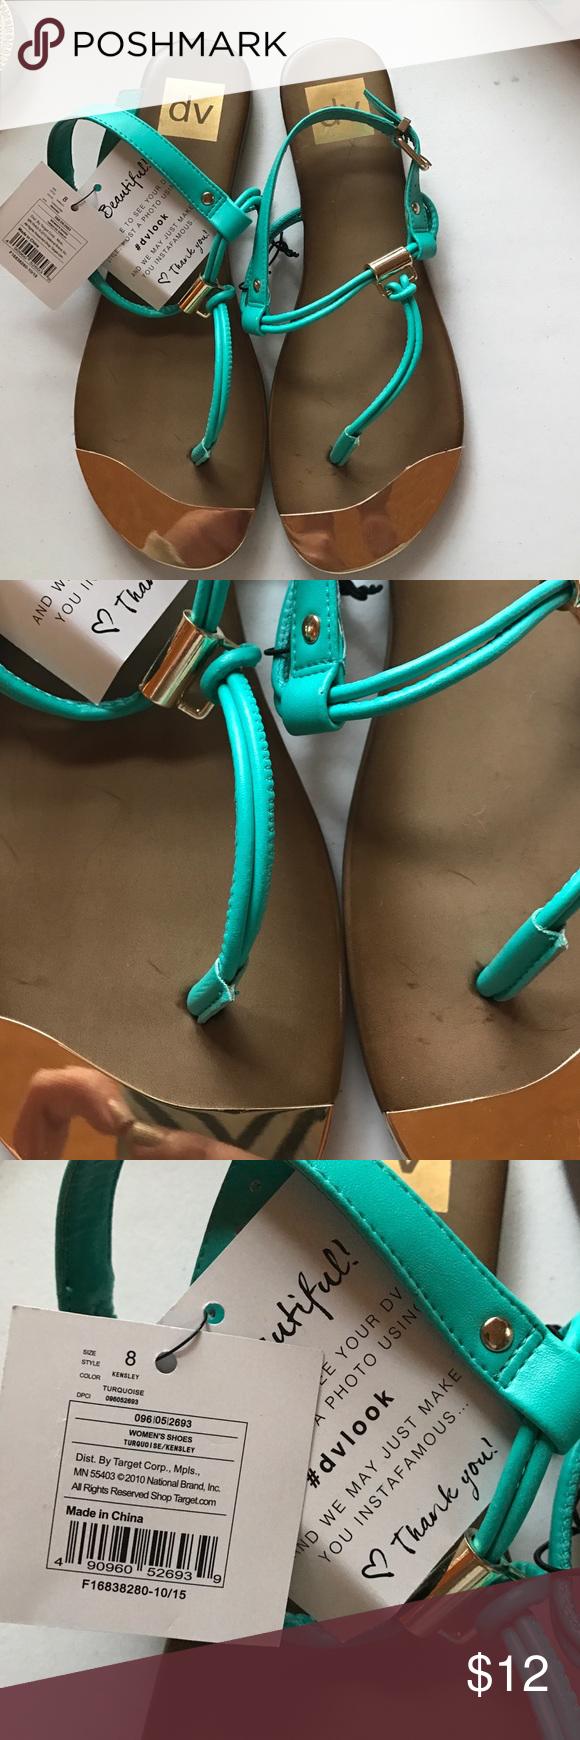 Selling this NWT DV dolce vita sandals size 8 on Poshmark! My username is: amandadotcom. #shopmycloset #poshmark #fashion #shopping #style #forsale #DV by Dolce Vita #Shoes